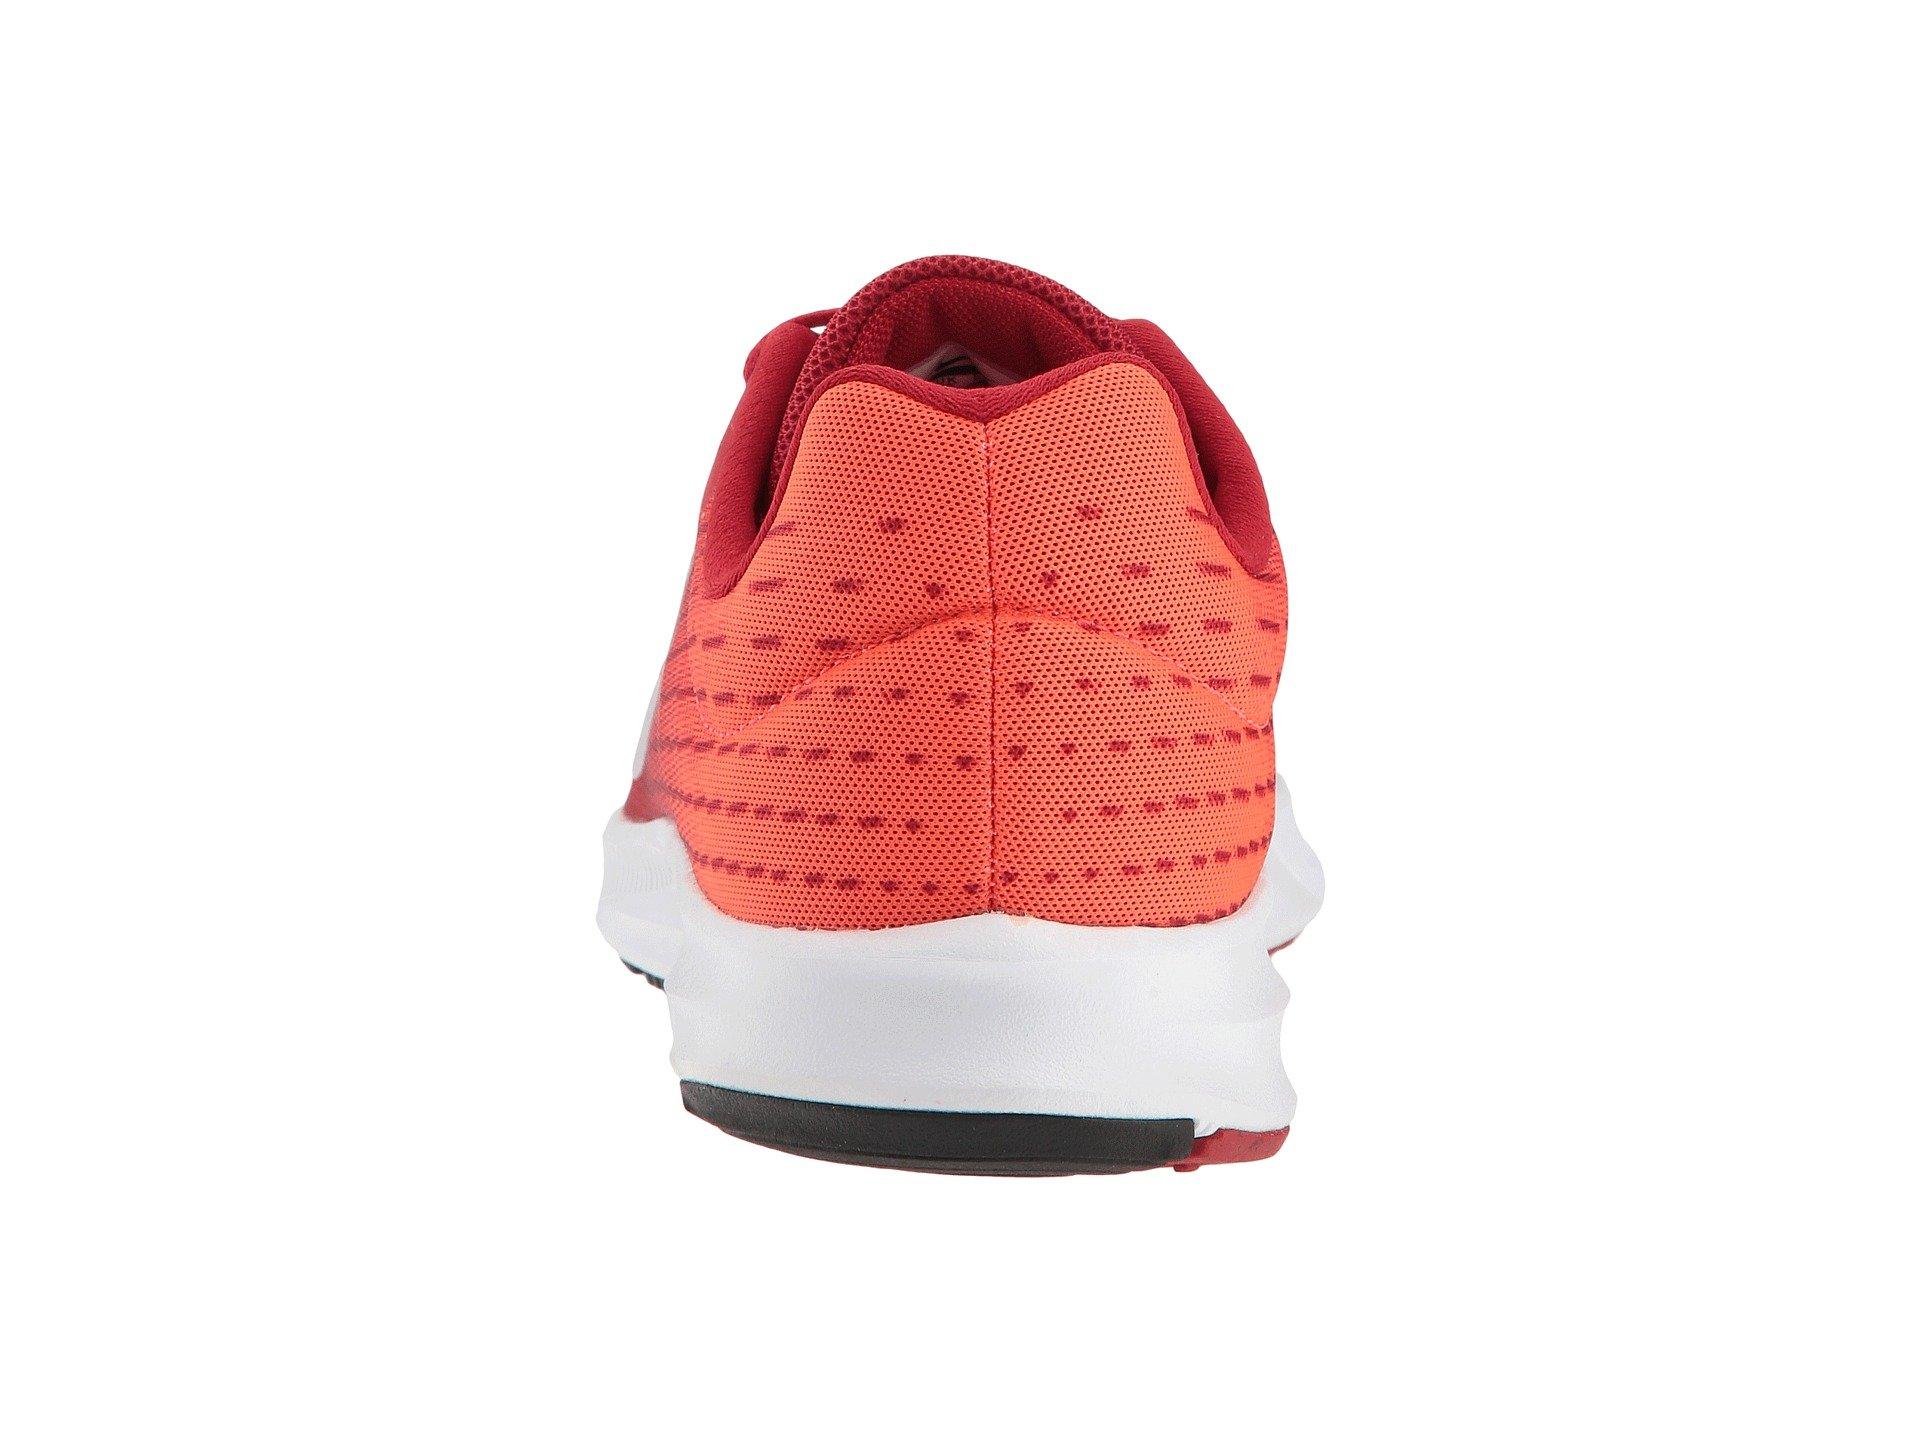 Grey Nike black Crimson 8 Gym bright Red vast Downshifter qPnXHwOpPT